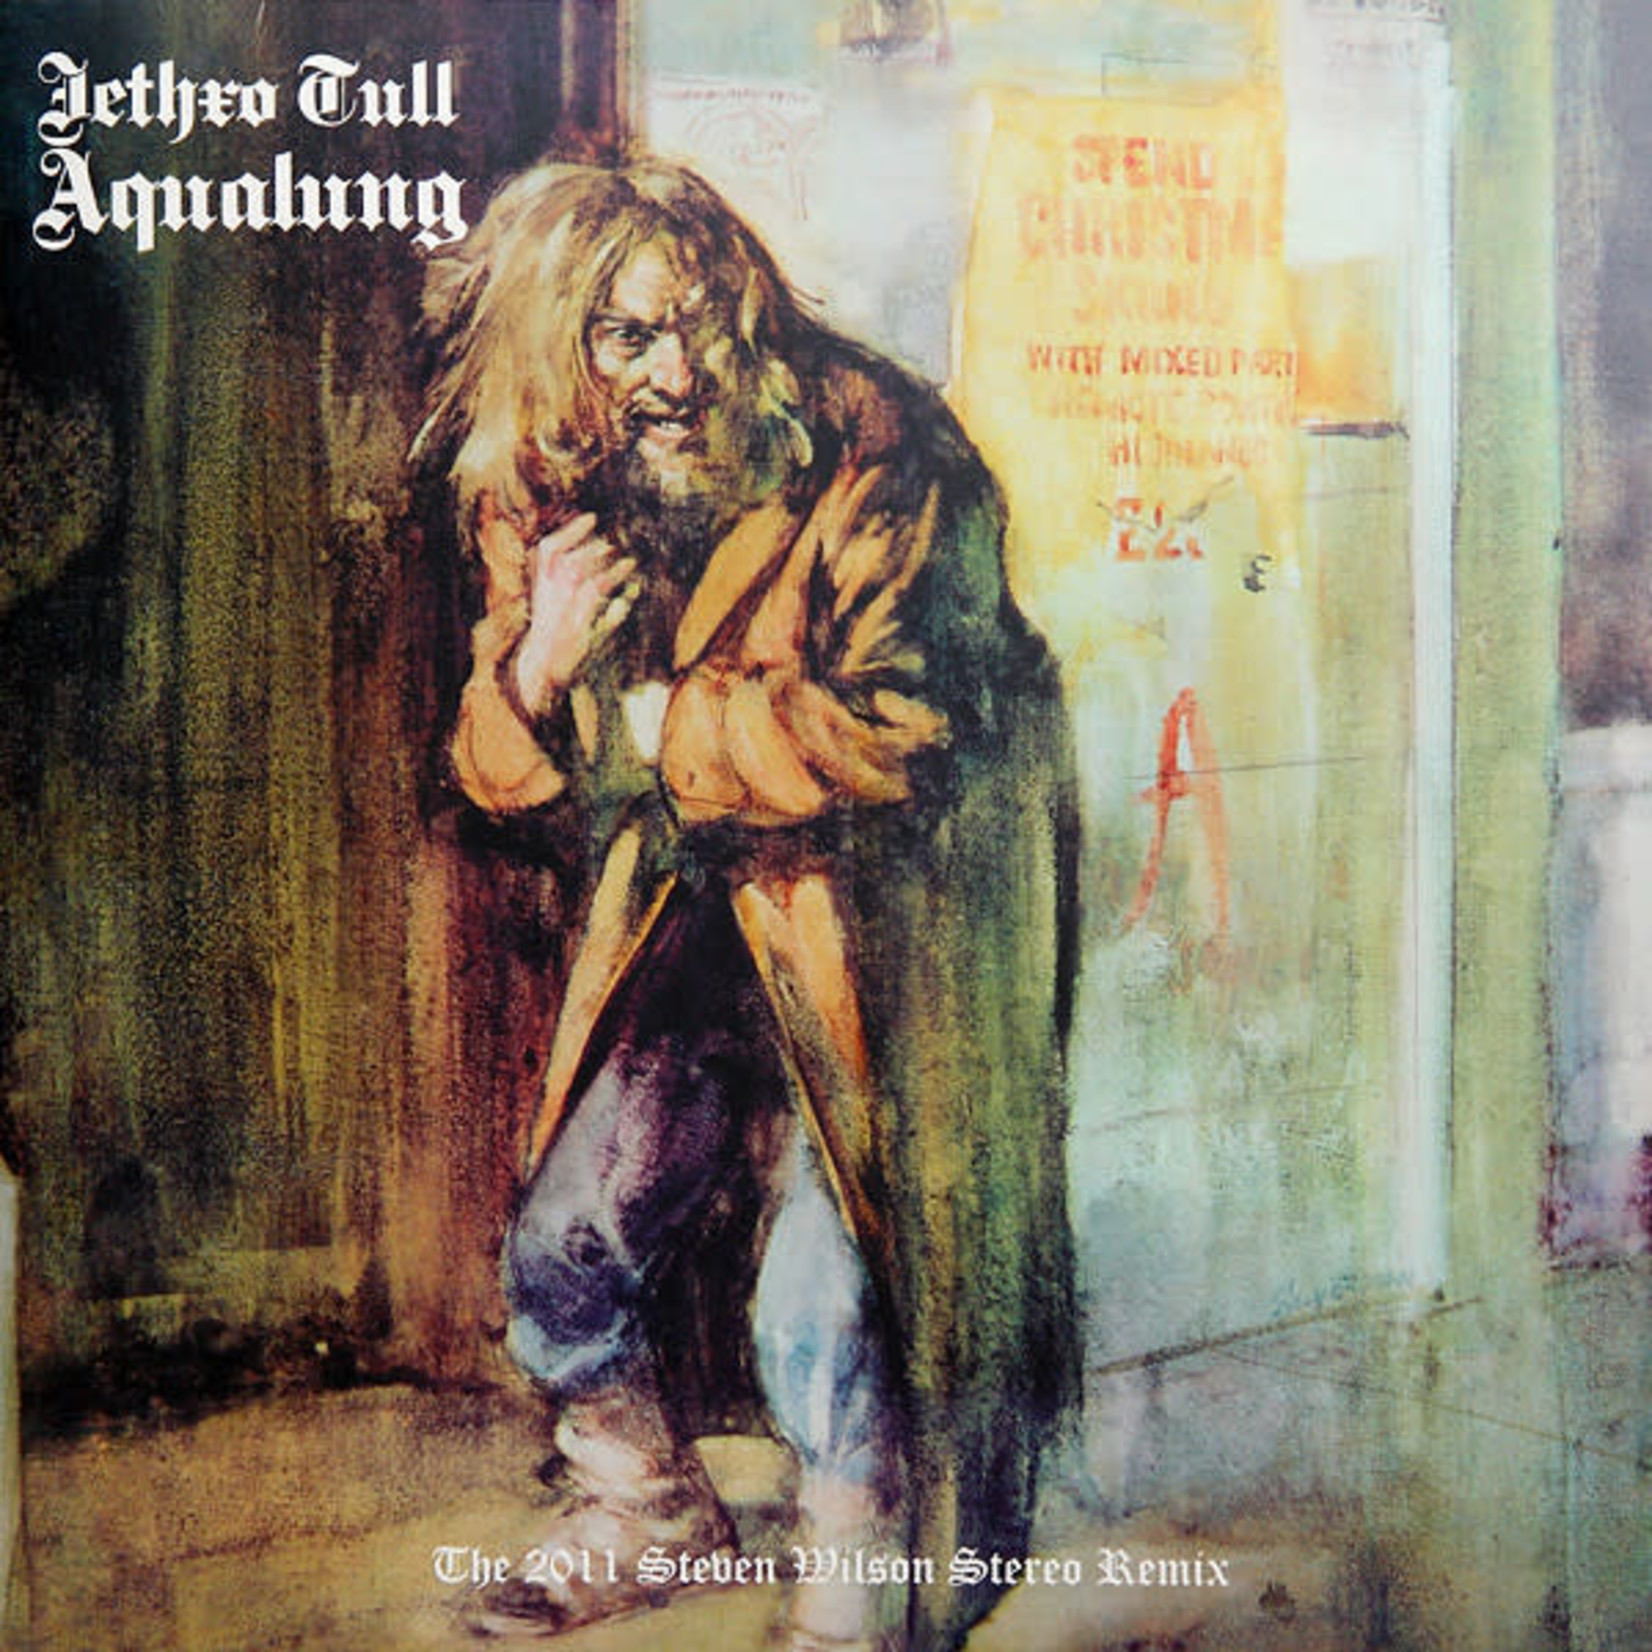 [New] Jethro Tull: Aqualung